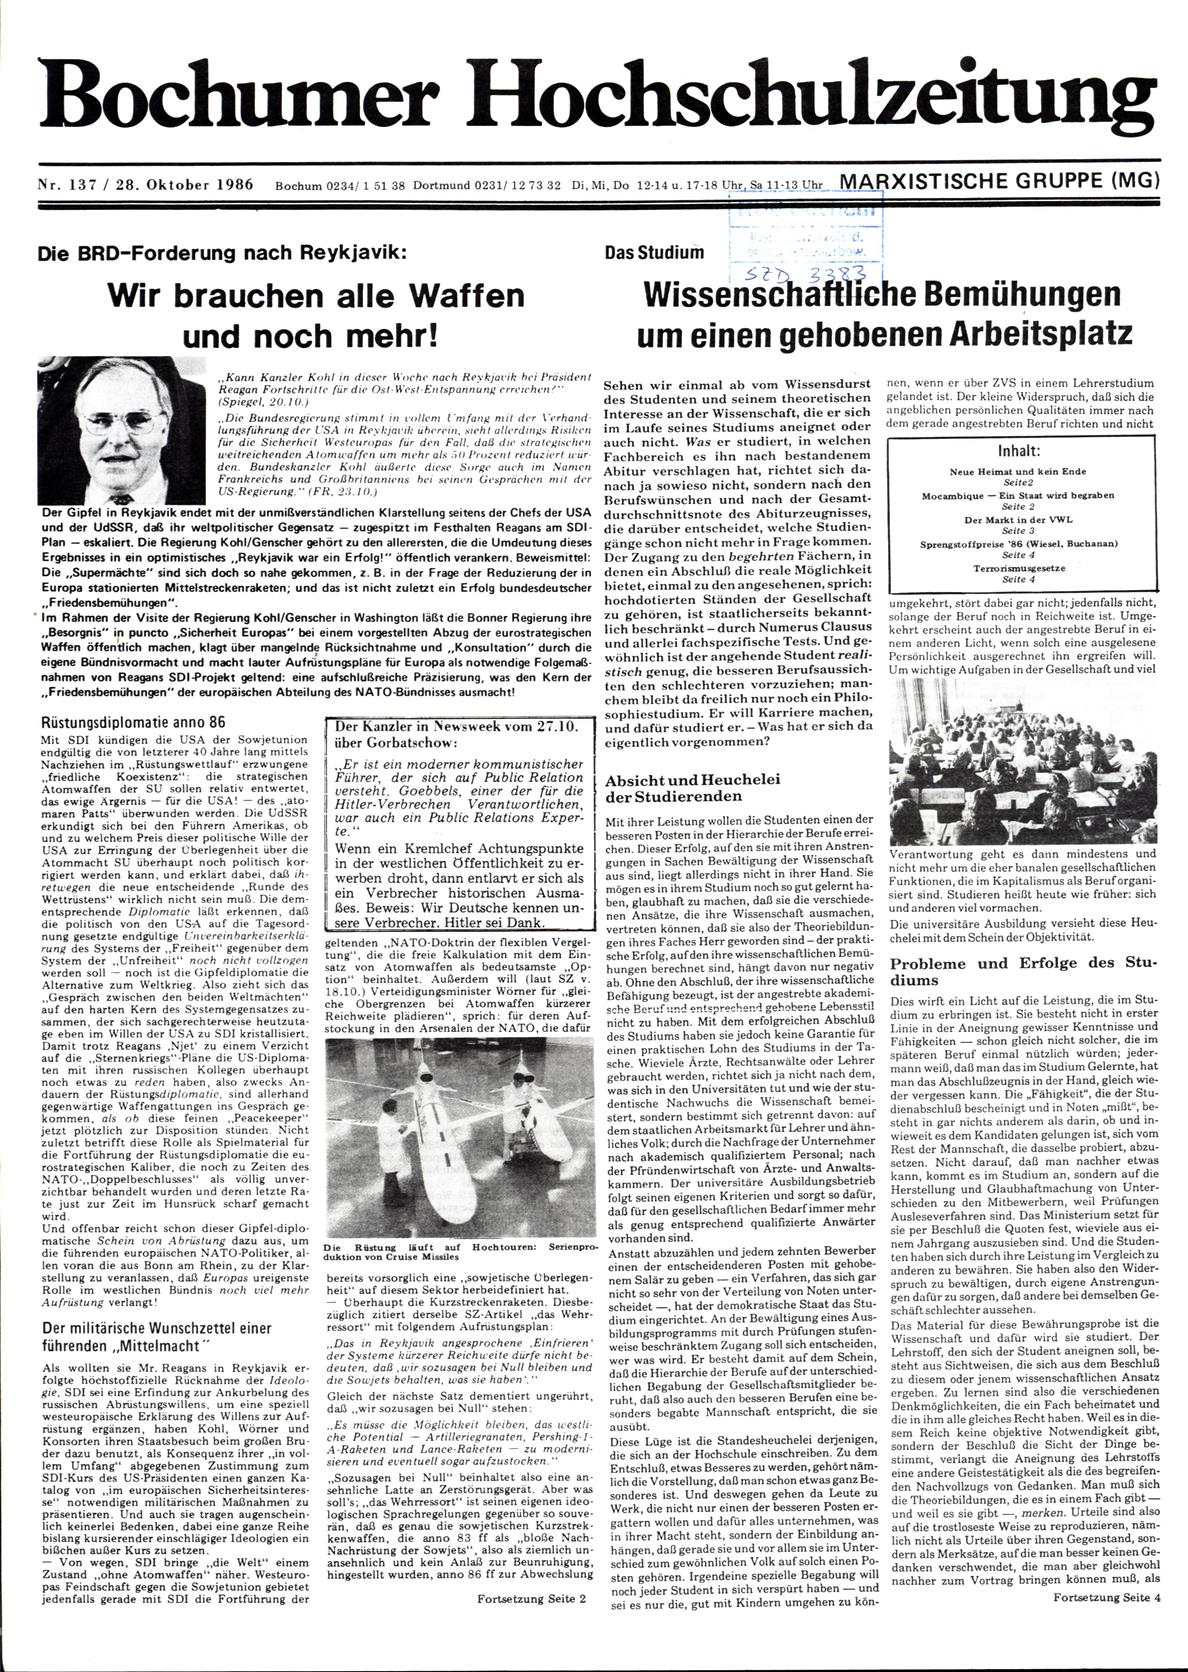 Bochum_BHZ_19861028_137_001